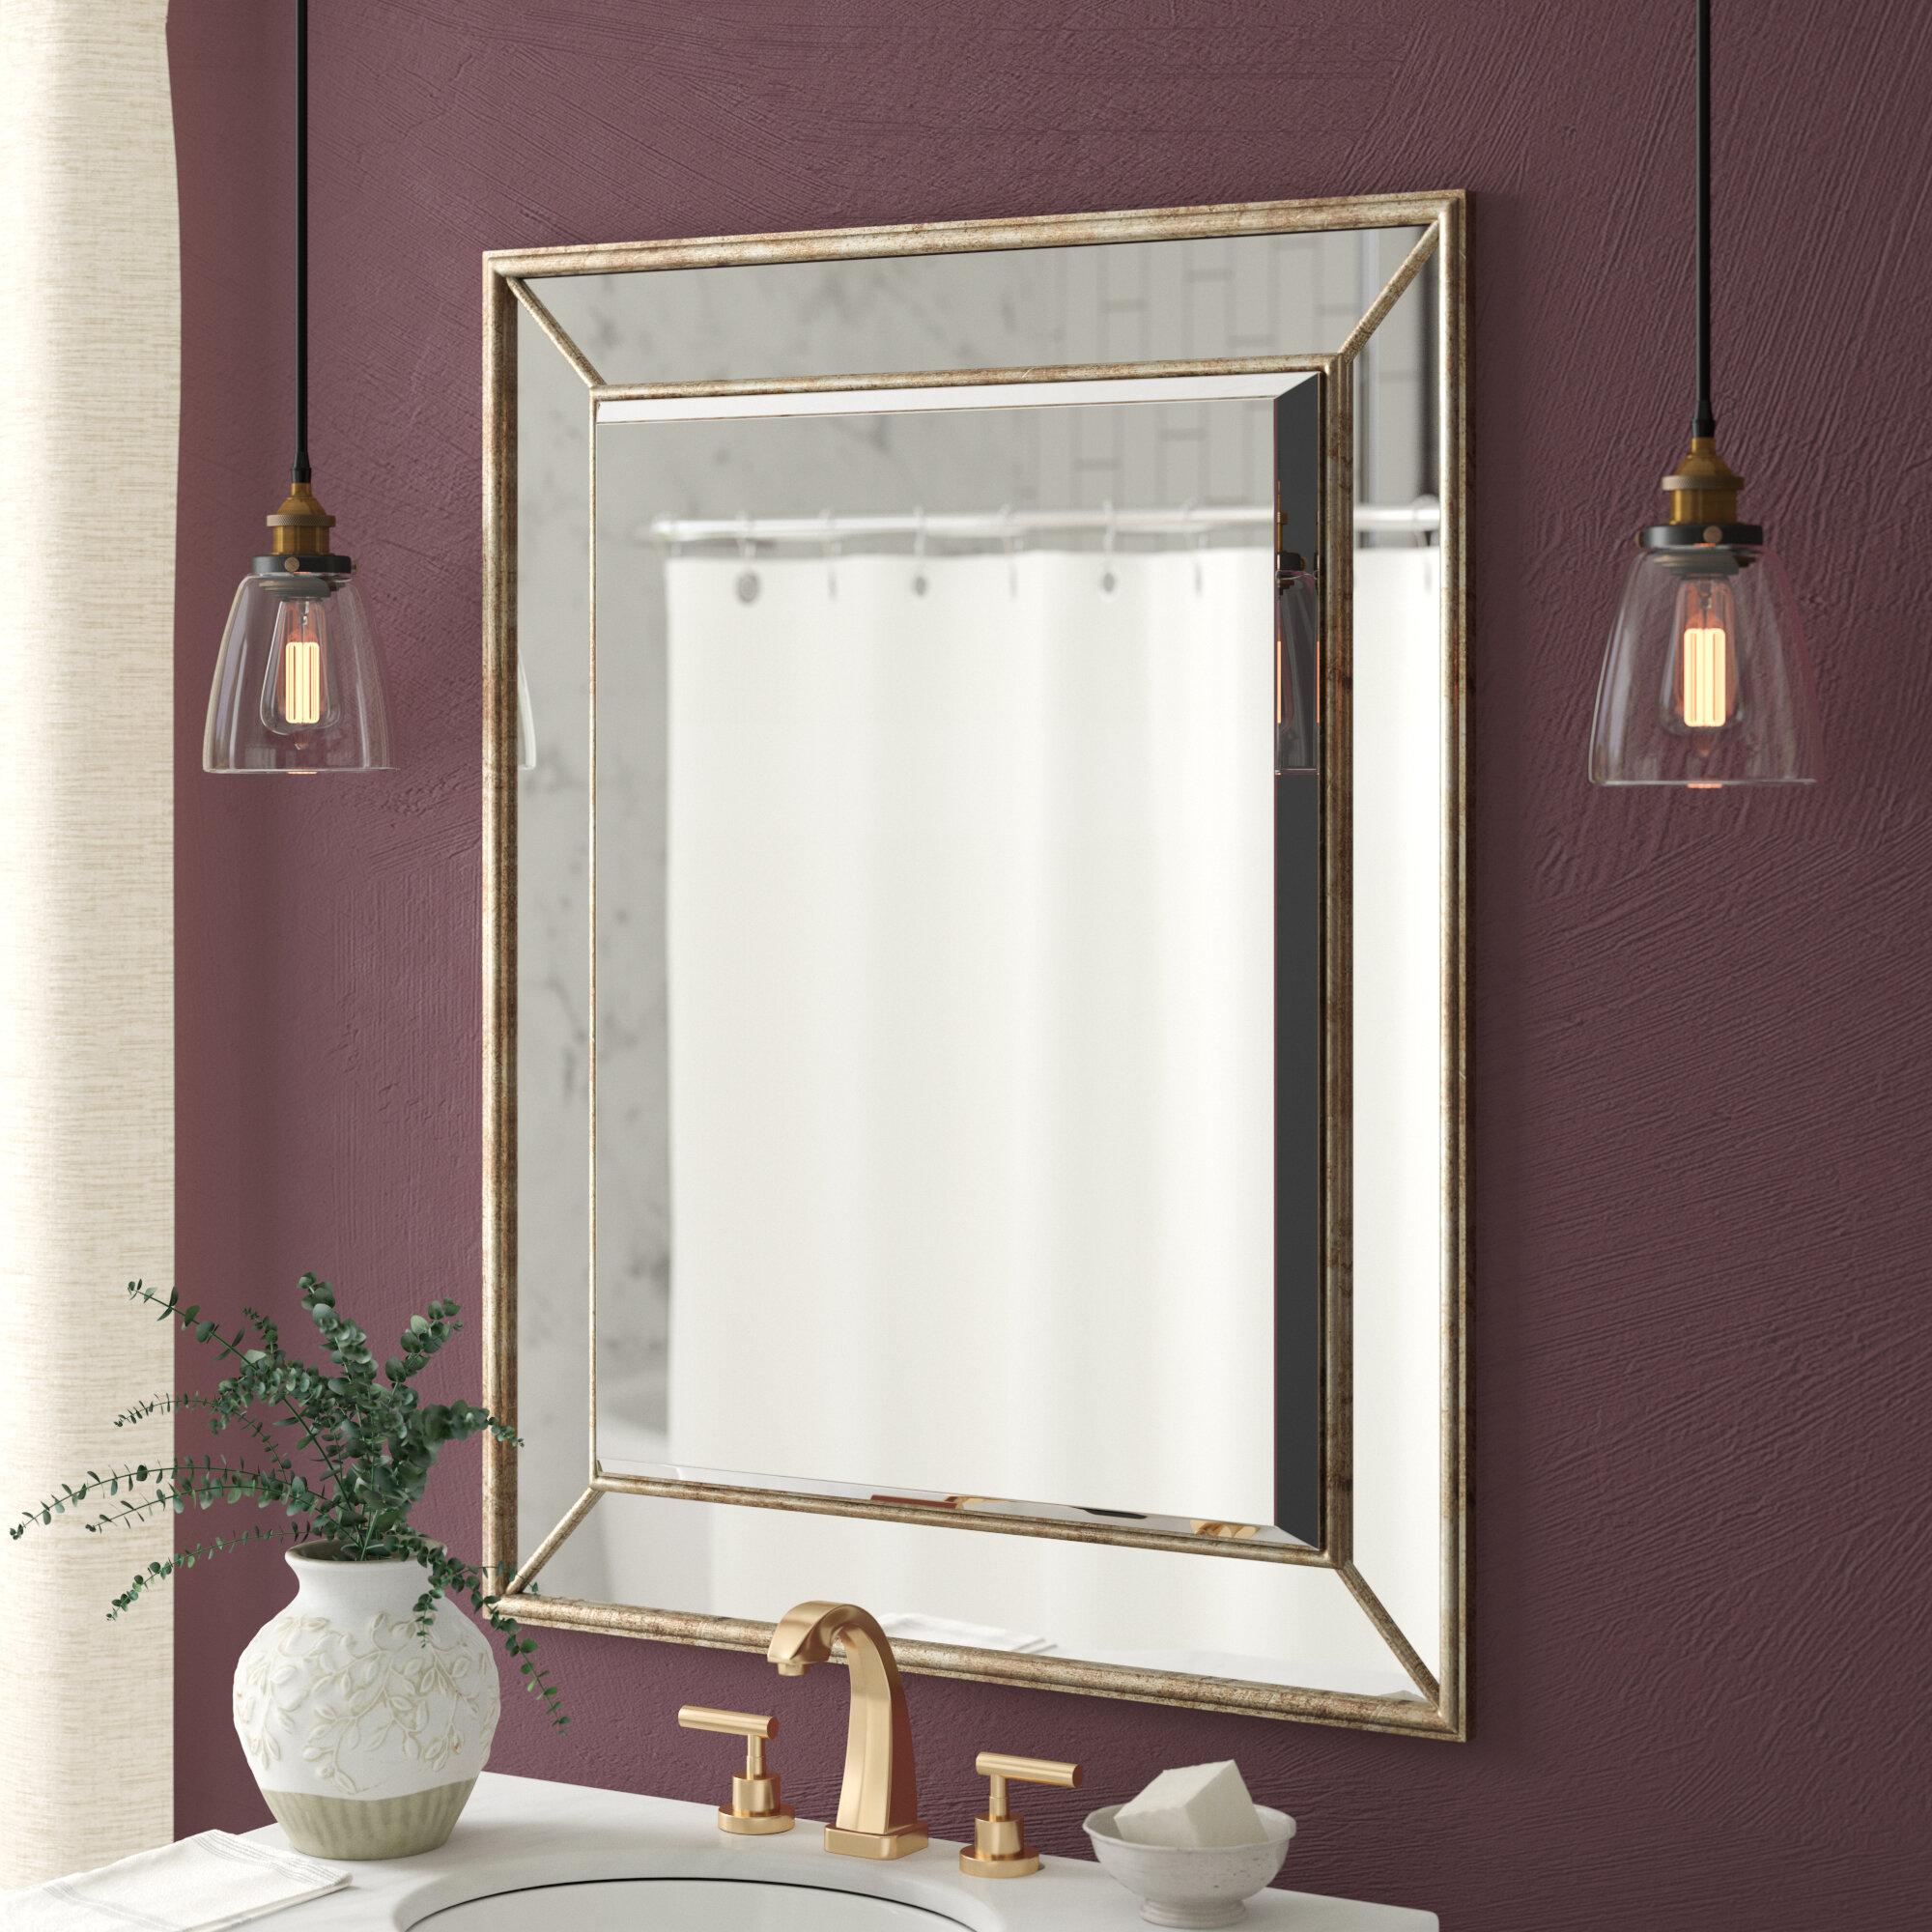 Maybery Rectangle Vertical Bathroom / Vanity Wall Mirror